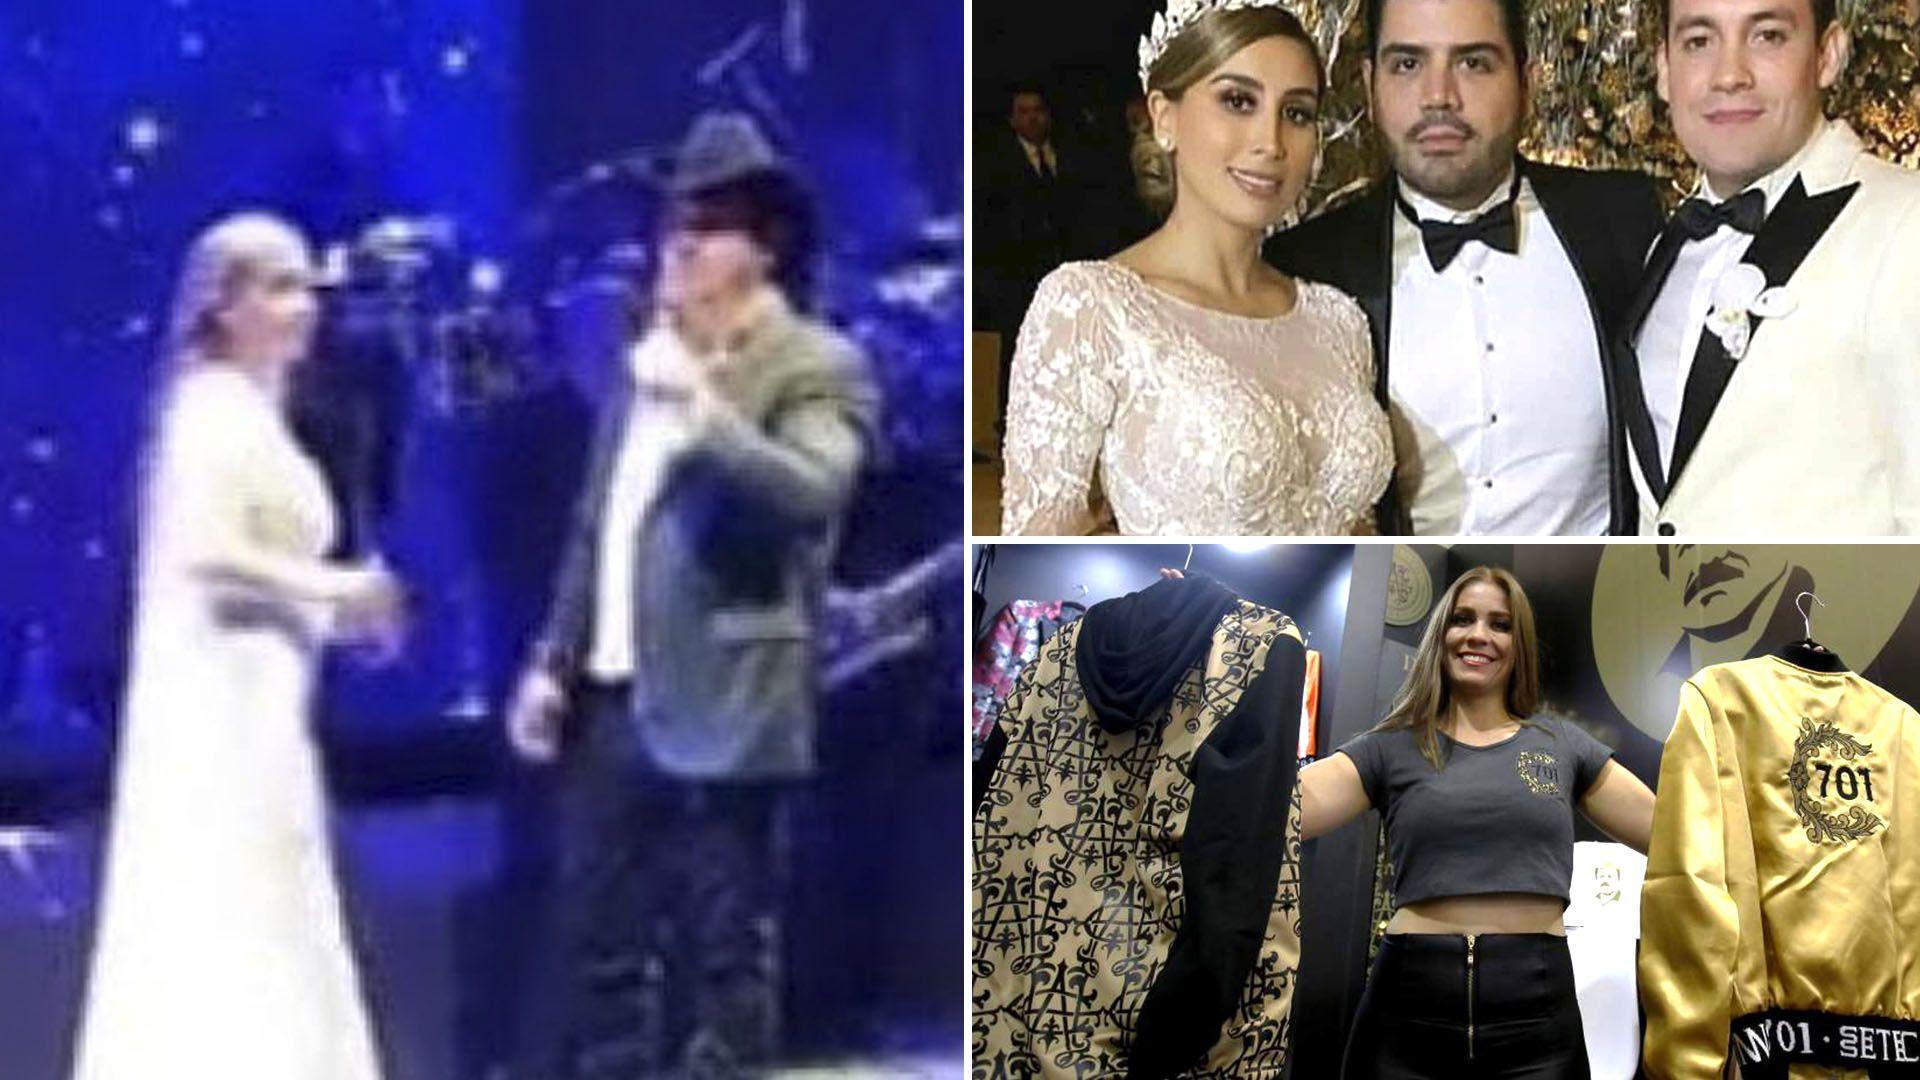 "La boda de Alejandrina Gisselle Guzmán Salazar, hija de Joaquín ""El Chapo"" Guzmán  (Foto: Twitter/@just_some_d00d)"